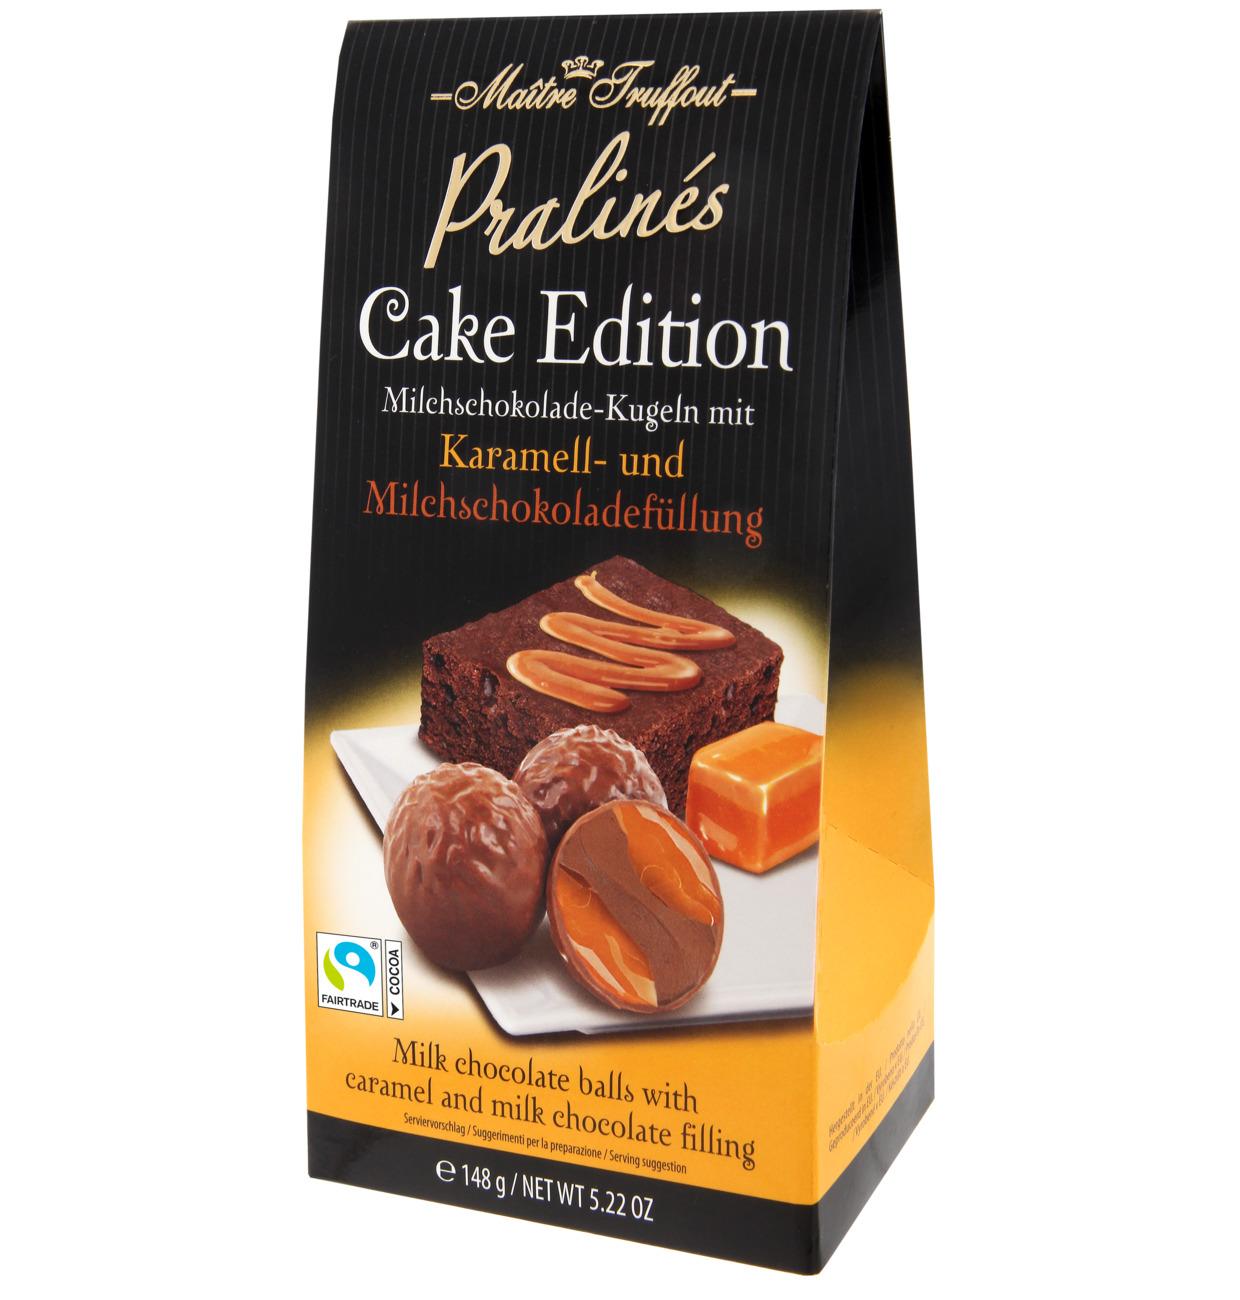 Pralinen Cake Edition – Karamell & Milchschokolade